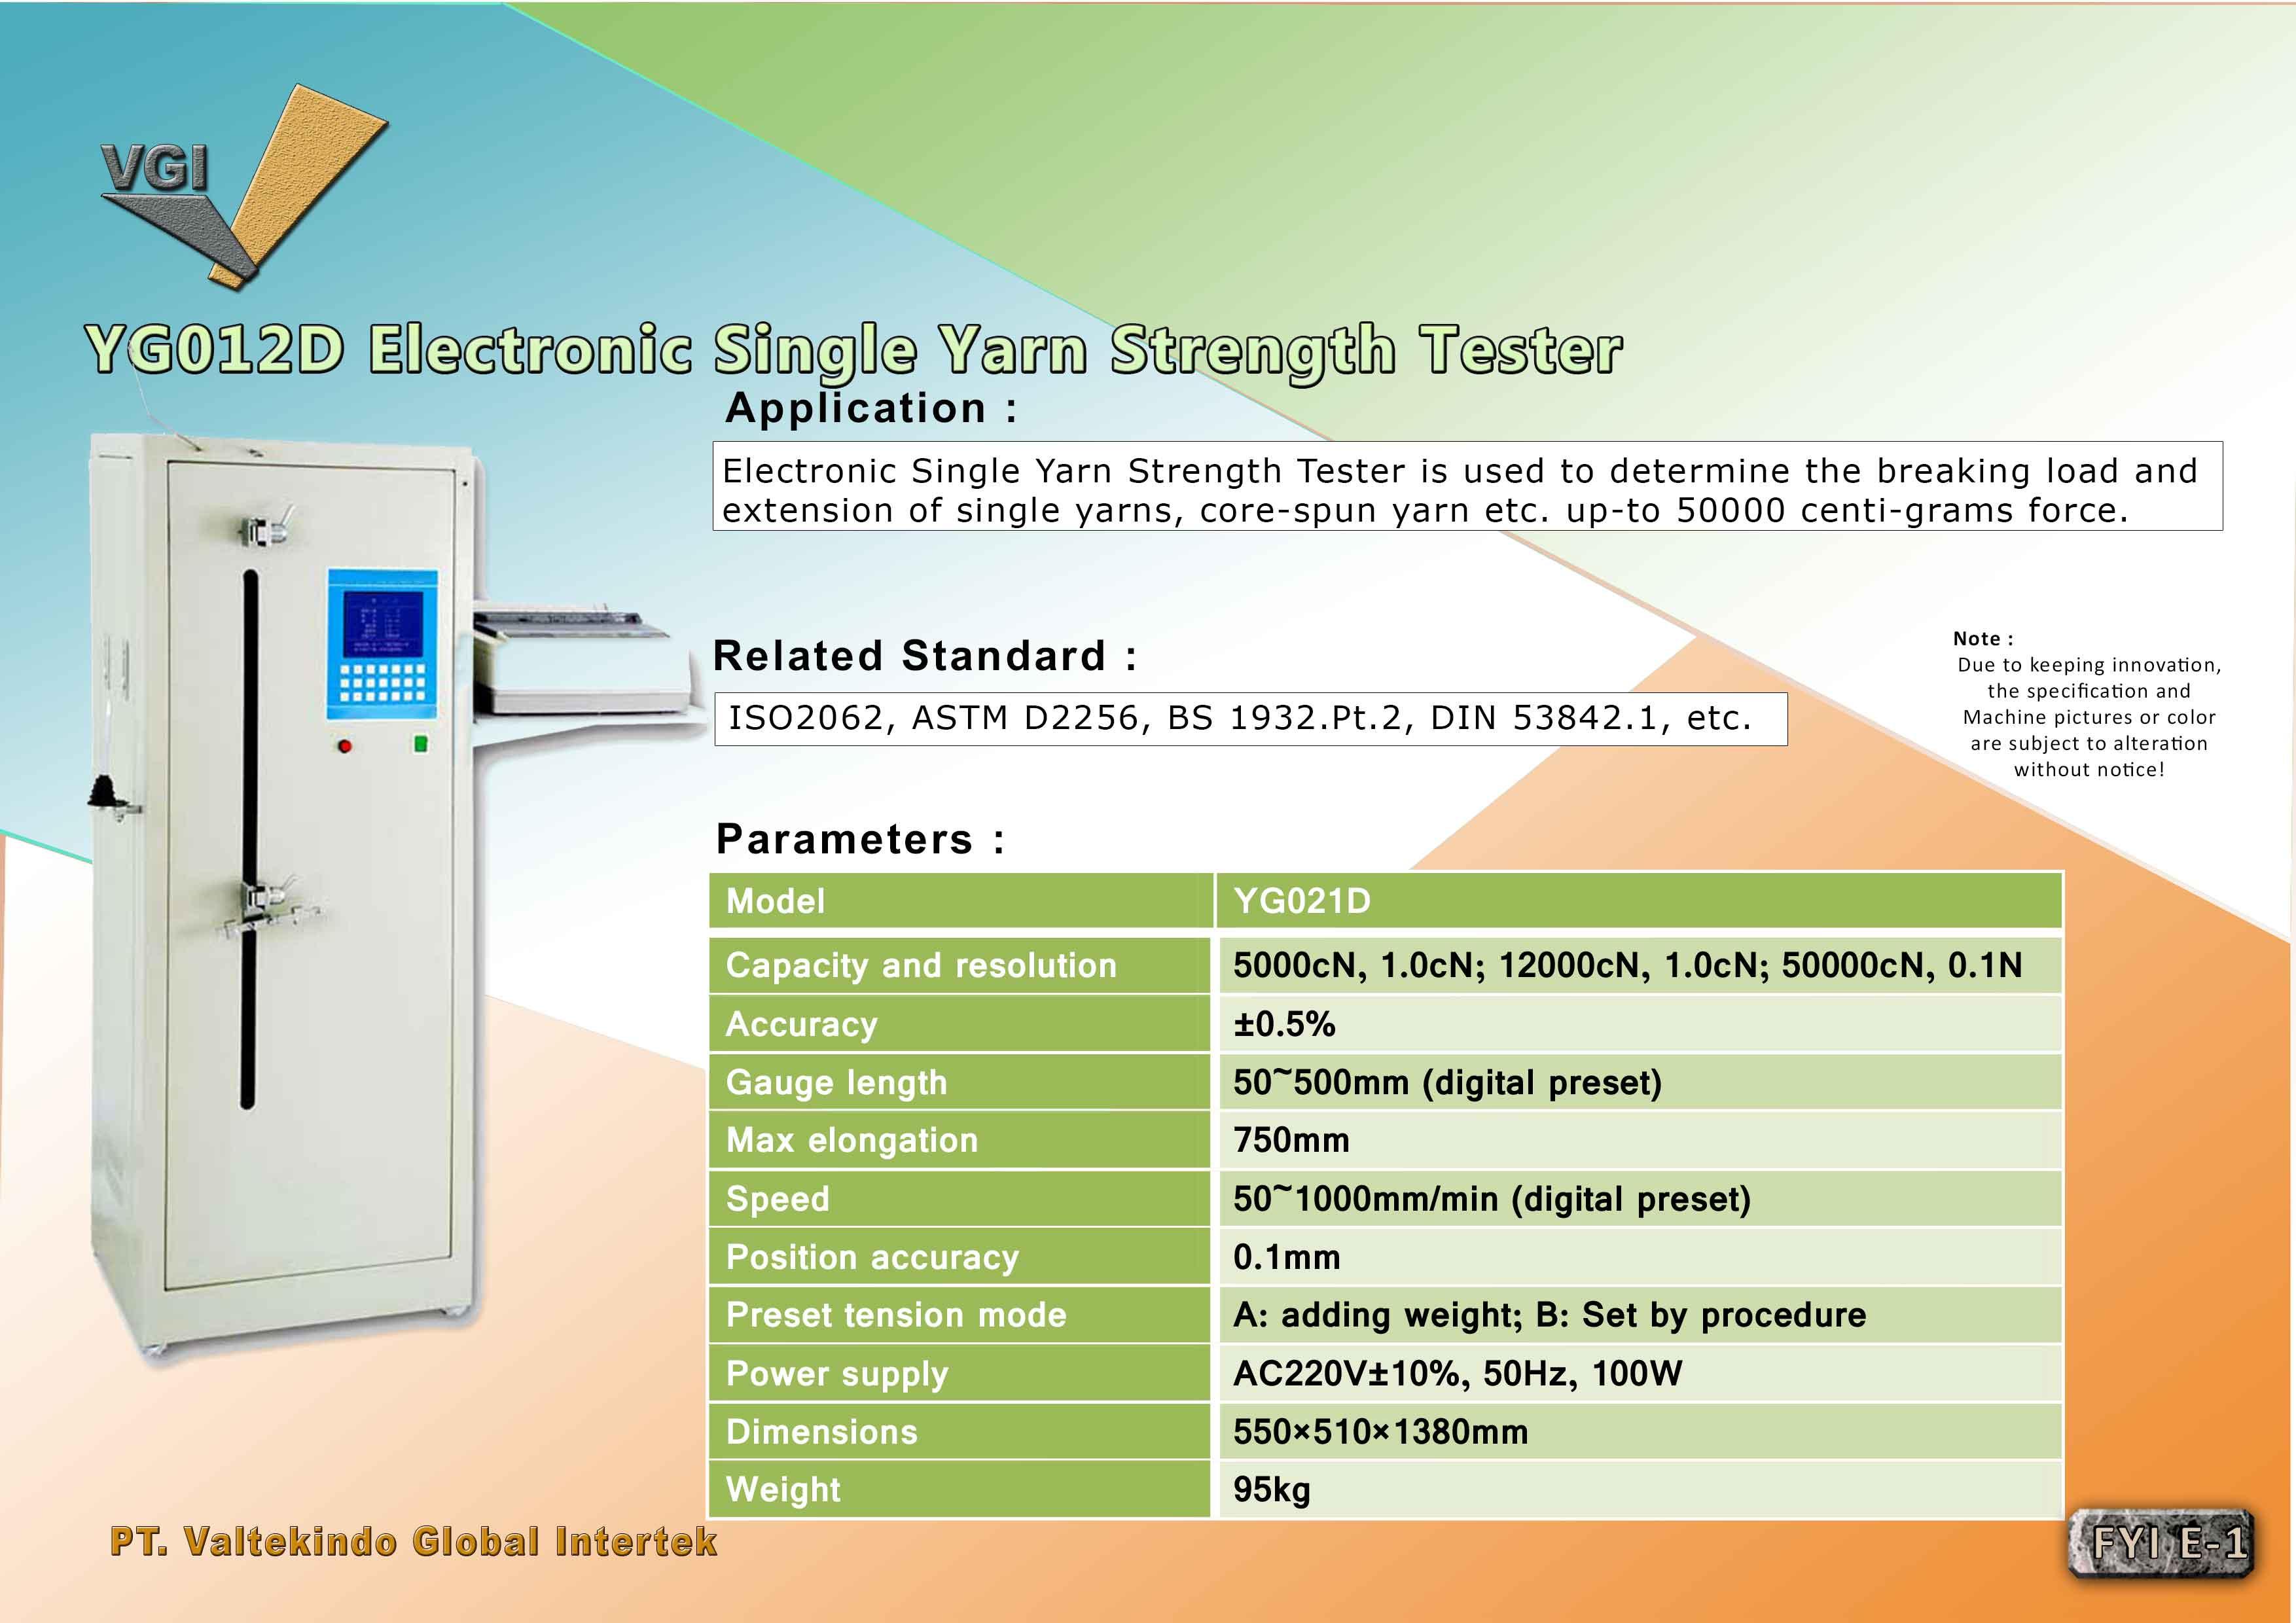 jual mesin Electronic Single Yarn Strength Tester  Electronic Single Yarn Strength Tester